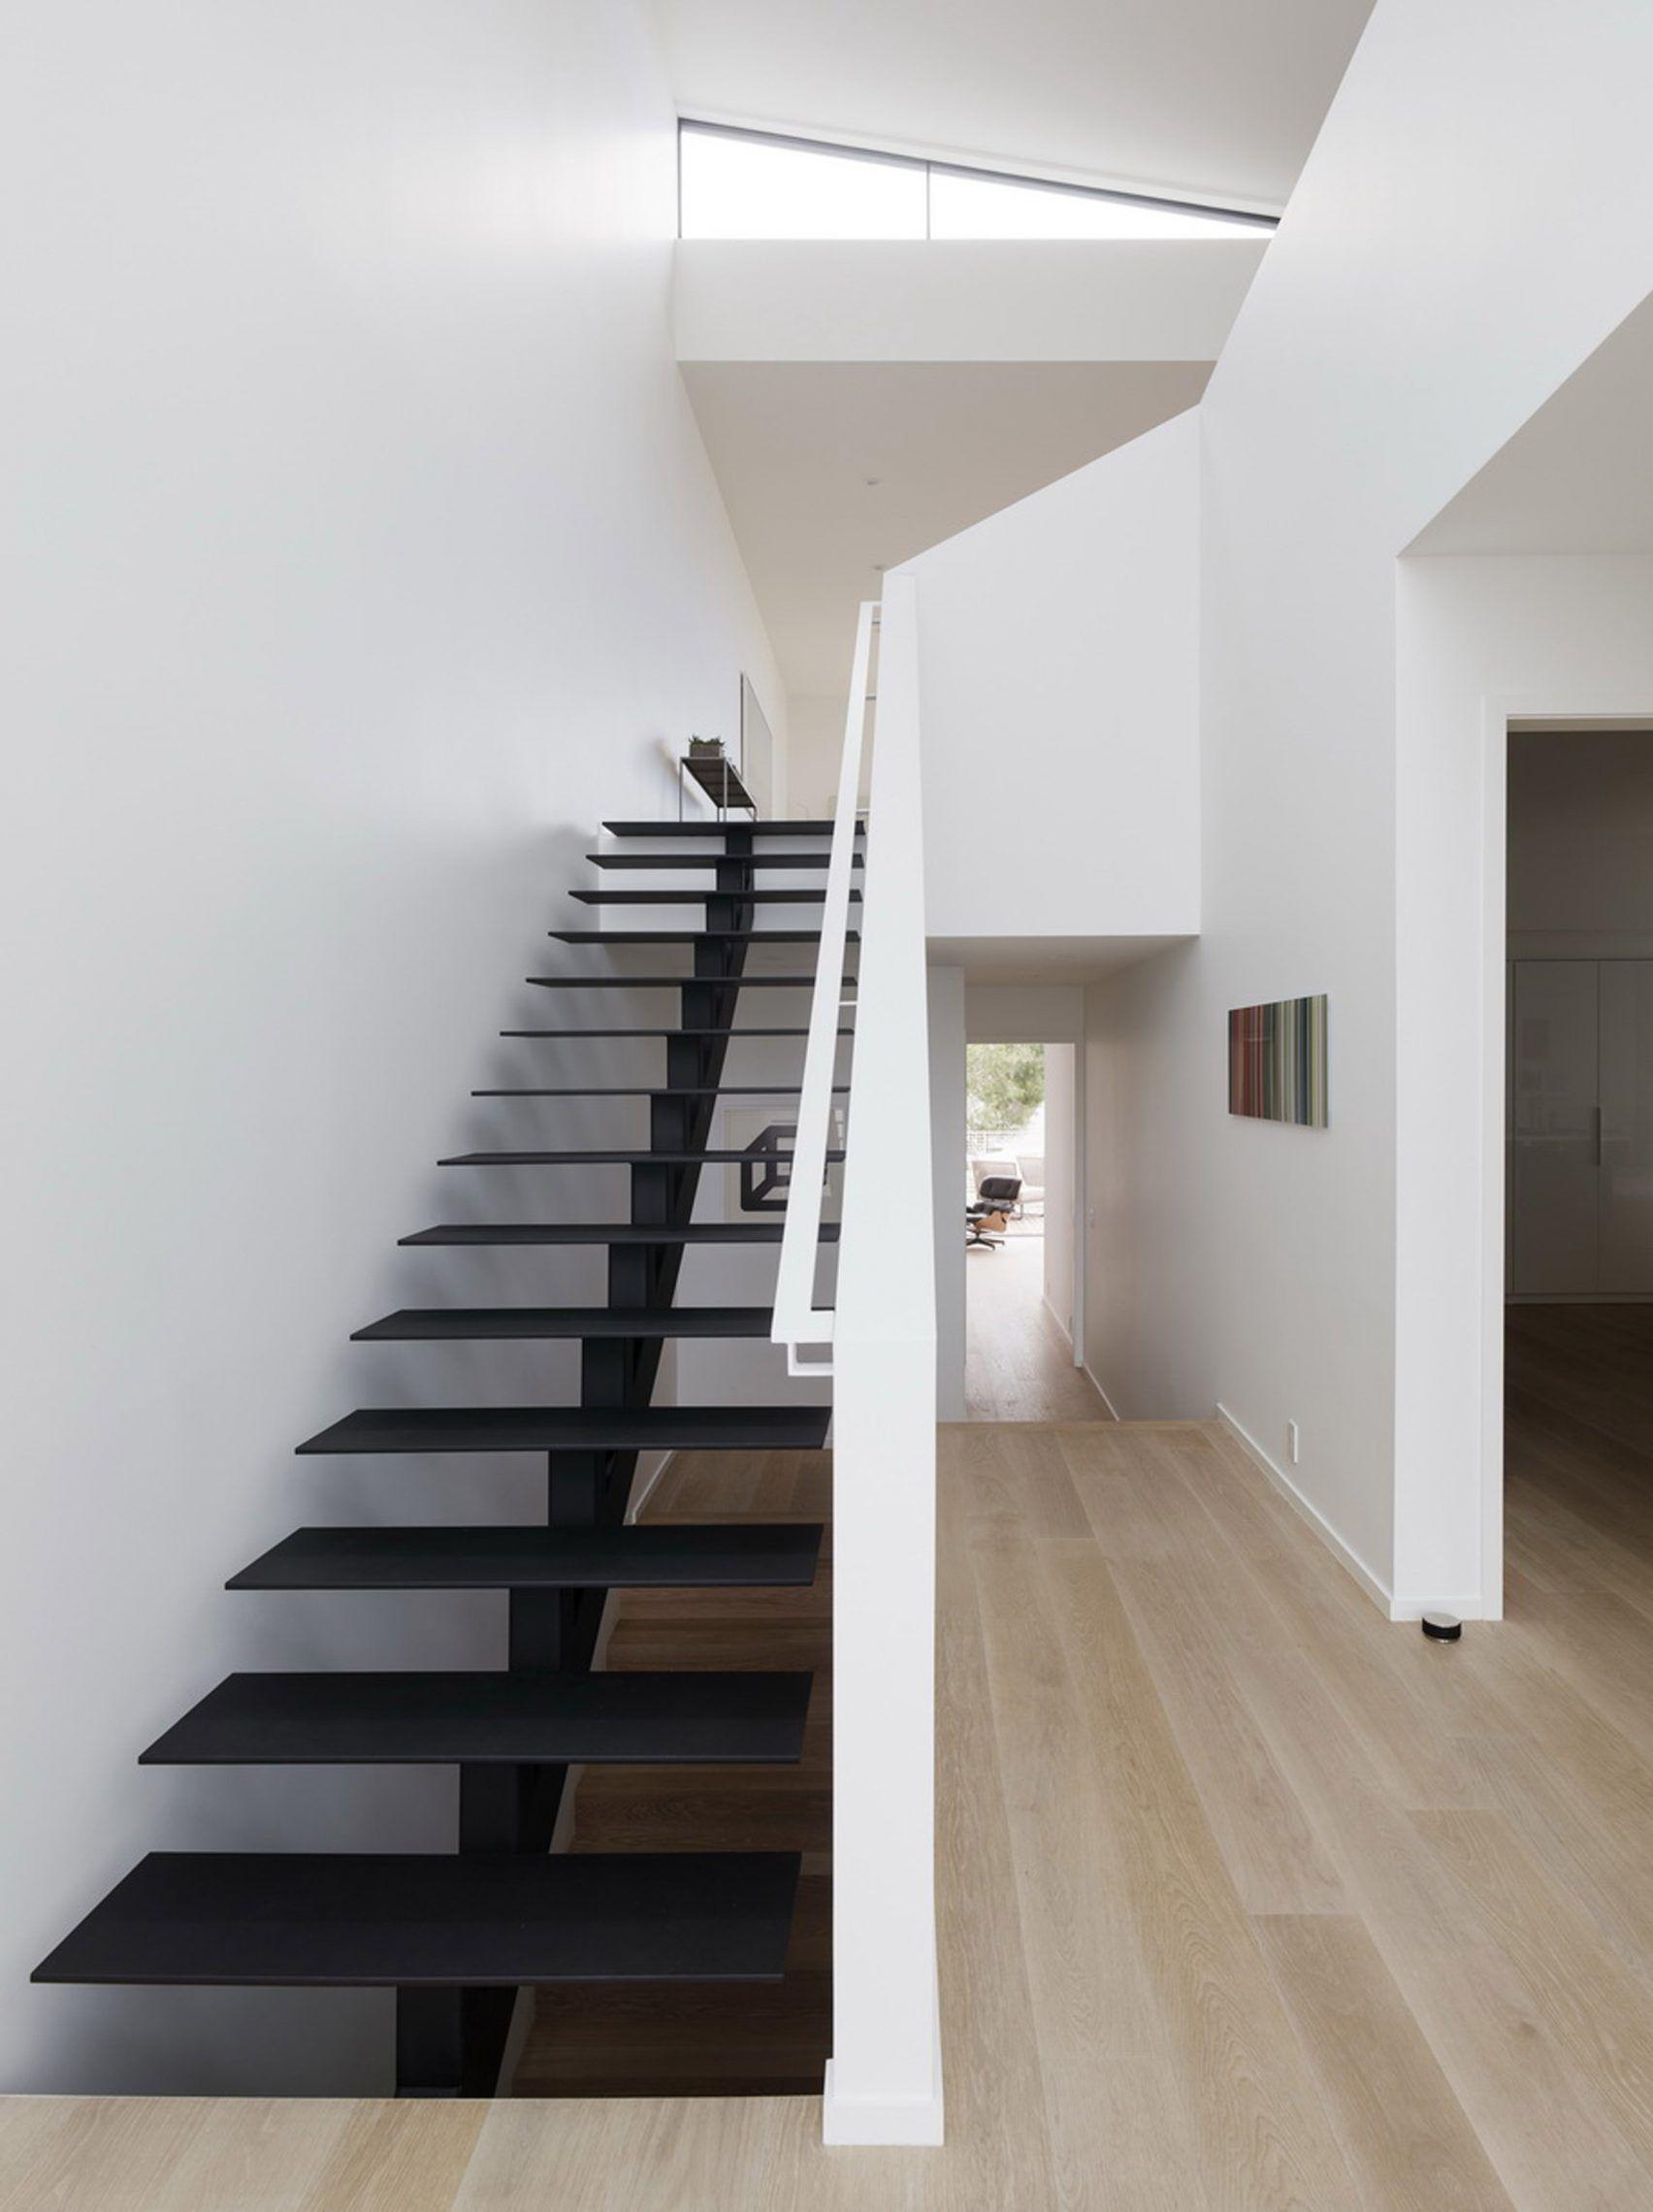 Best Edmonds Lee Creates White House For Sloped Street In San 400 x 300